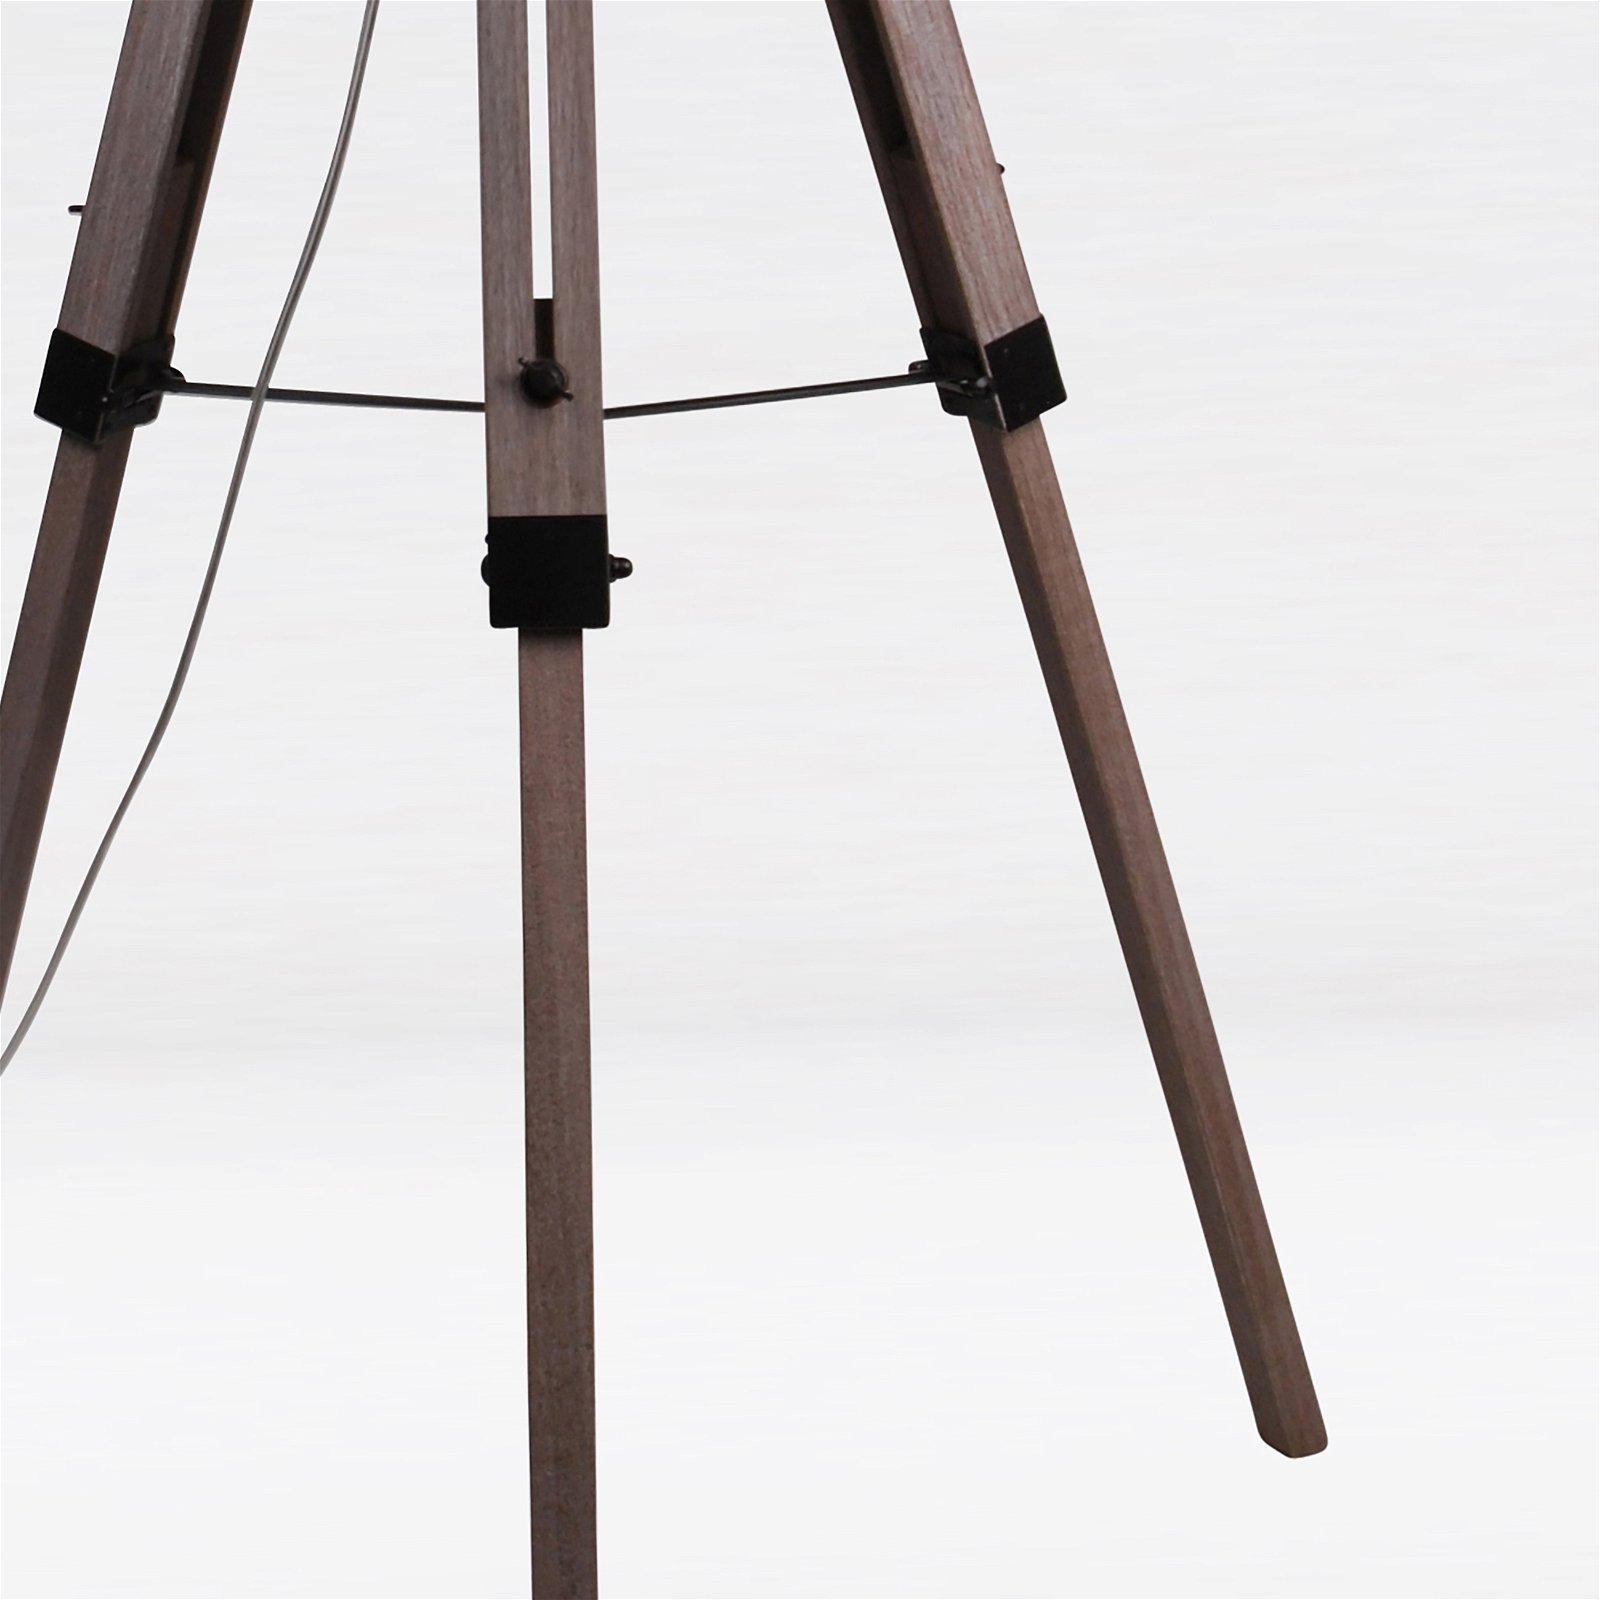 thumbnail 16 - Grey Wash Tripod Wood Table or Floor Lamp Black Painted Metal and Grey Shade